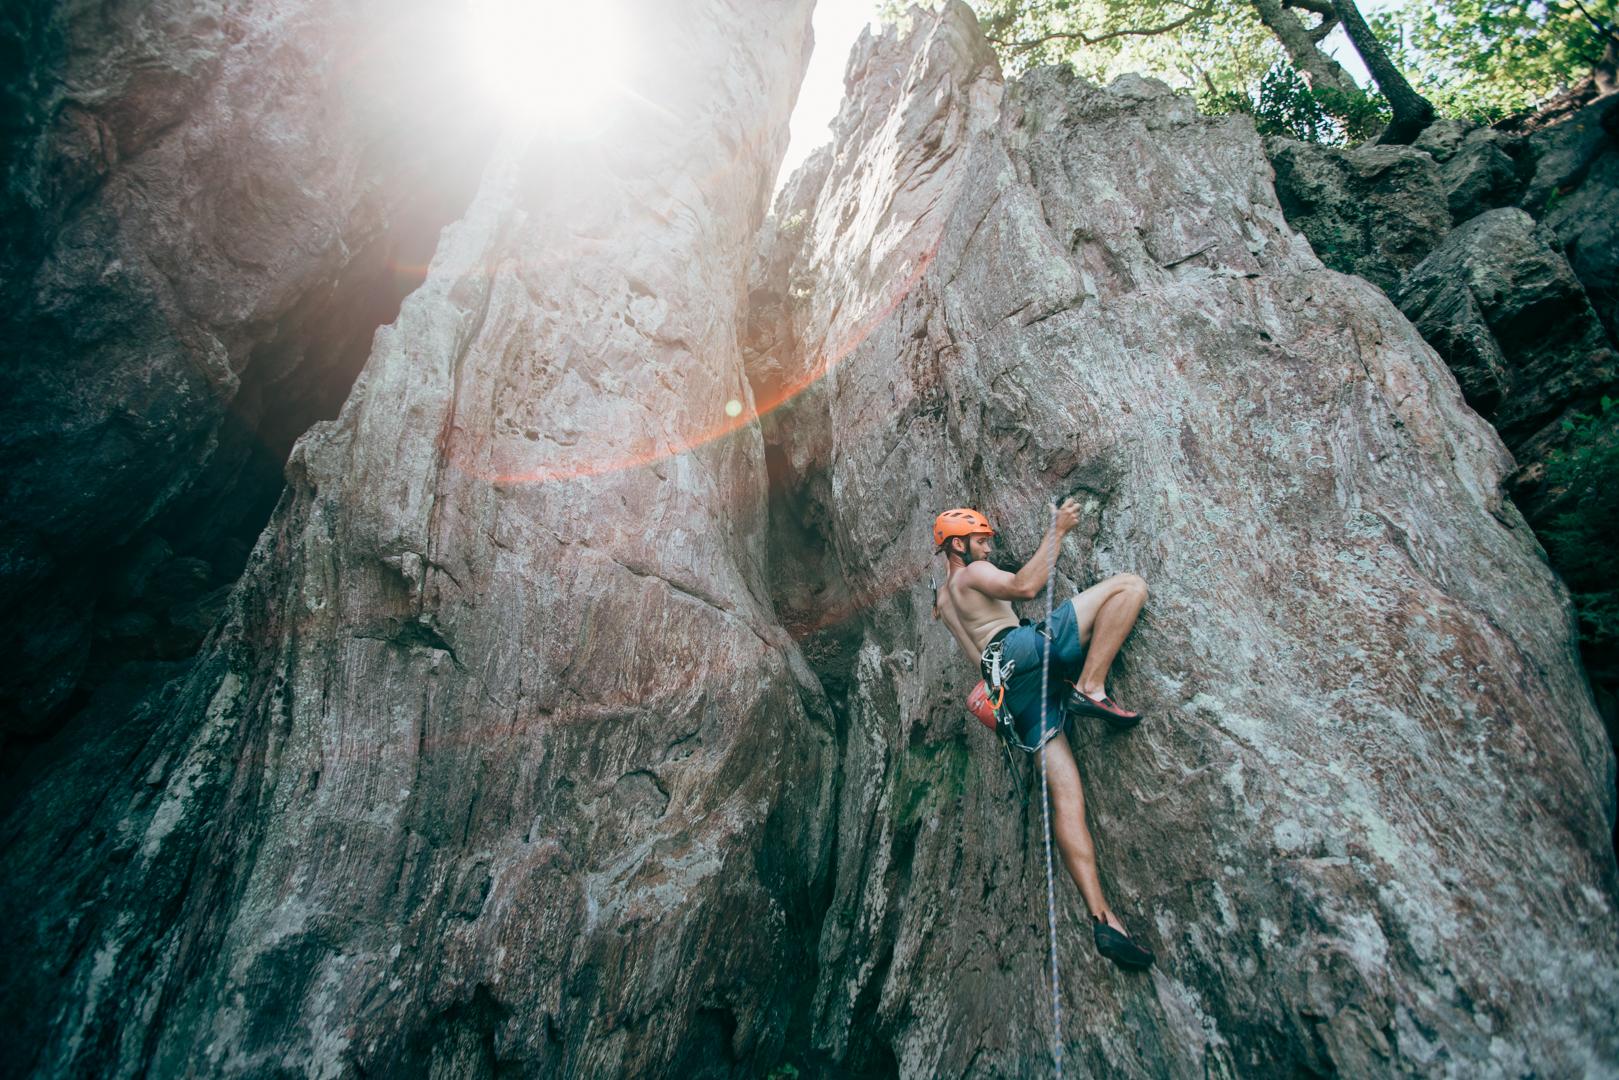 Climber-2.jpg